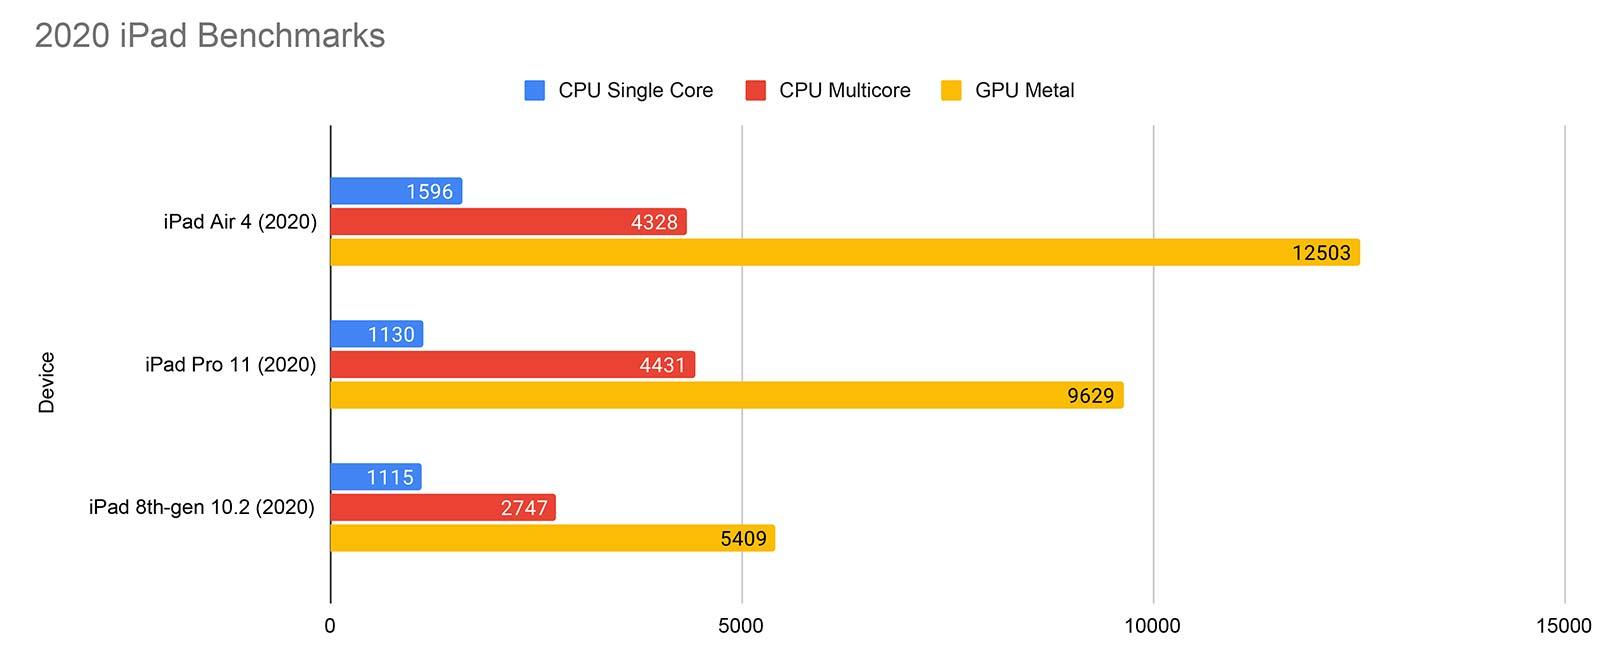 iPad benchmarks in 2020